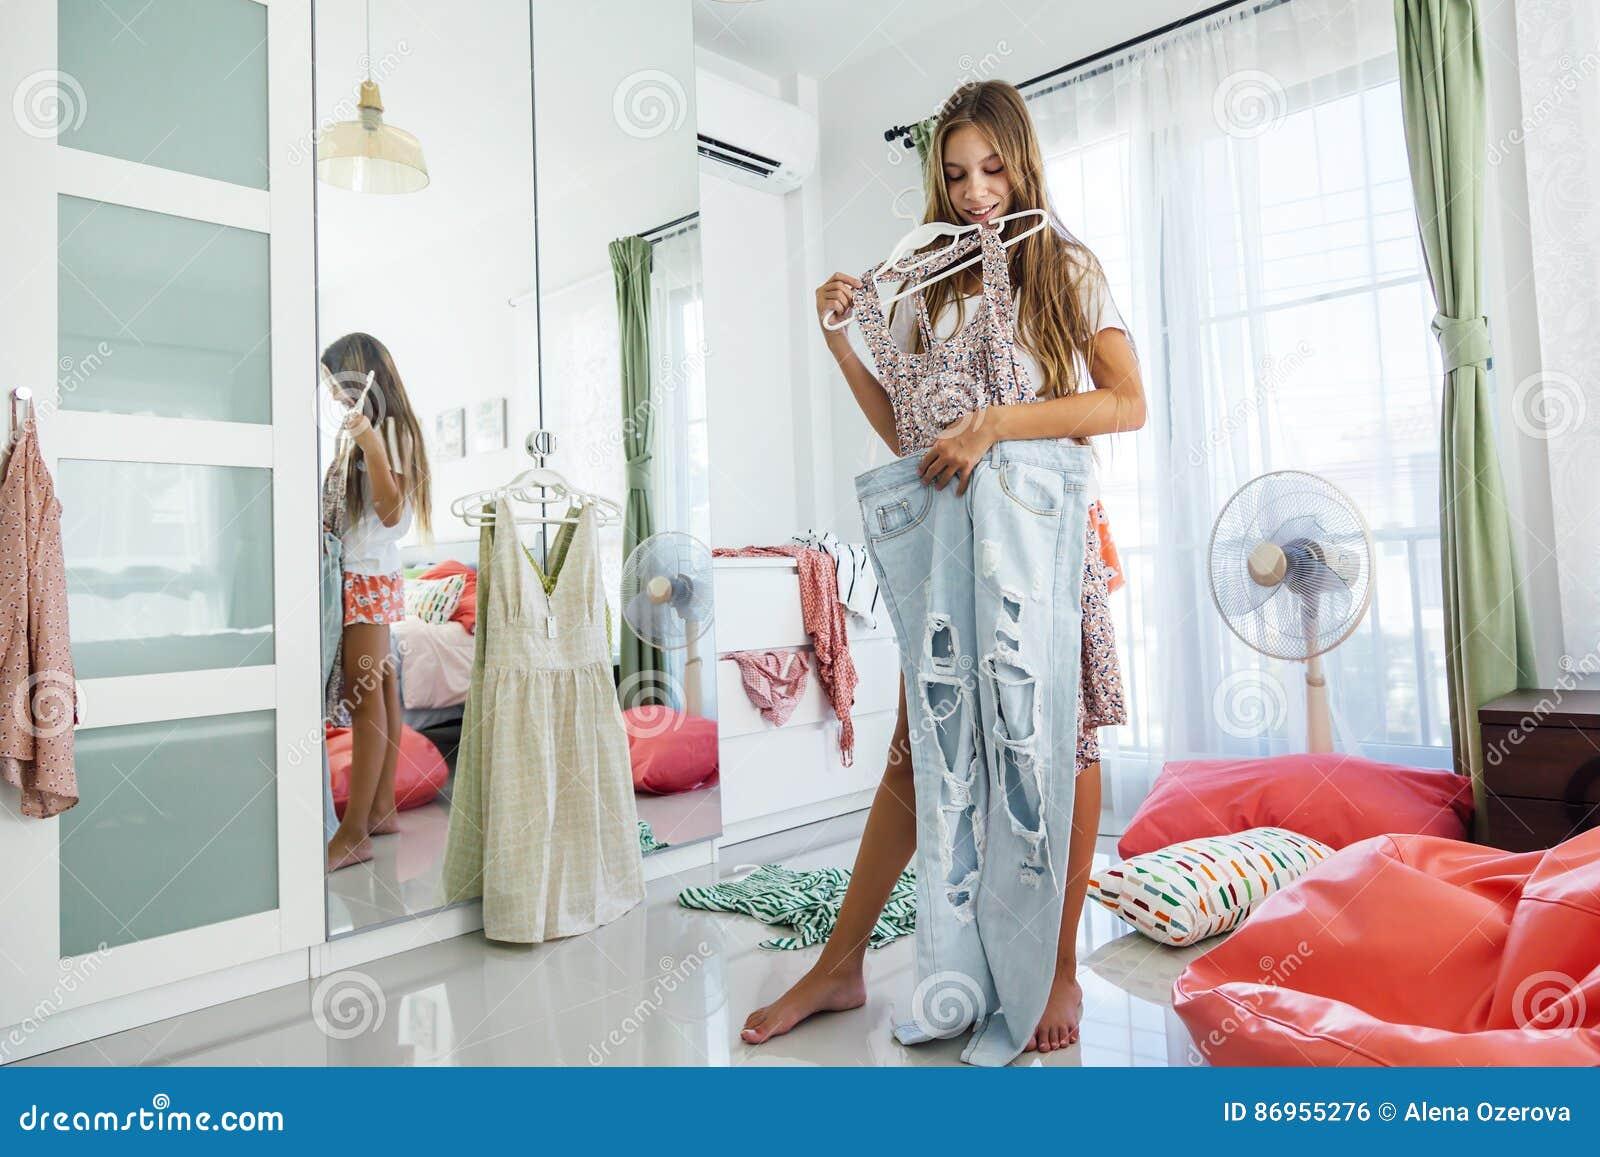 Tiener die kleding in kast kiezen stock foto afbeelding 86955276 - Tiener meubilair ruimte meisje ...